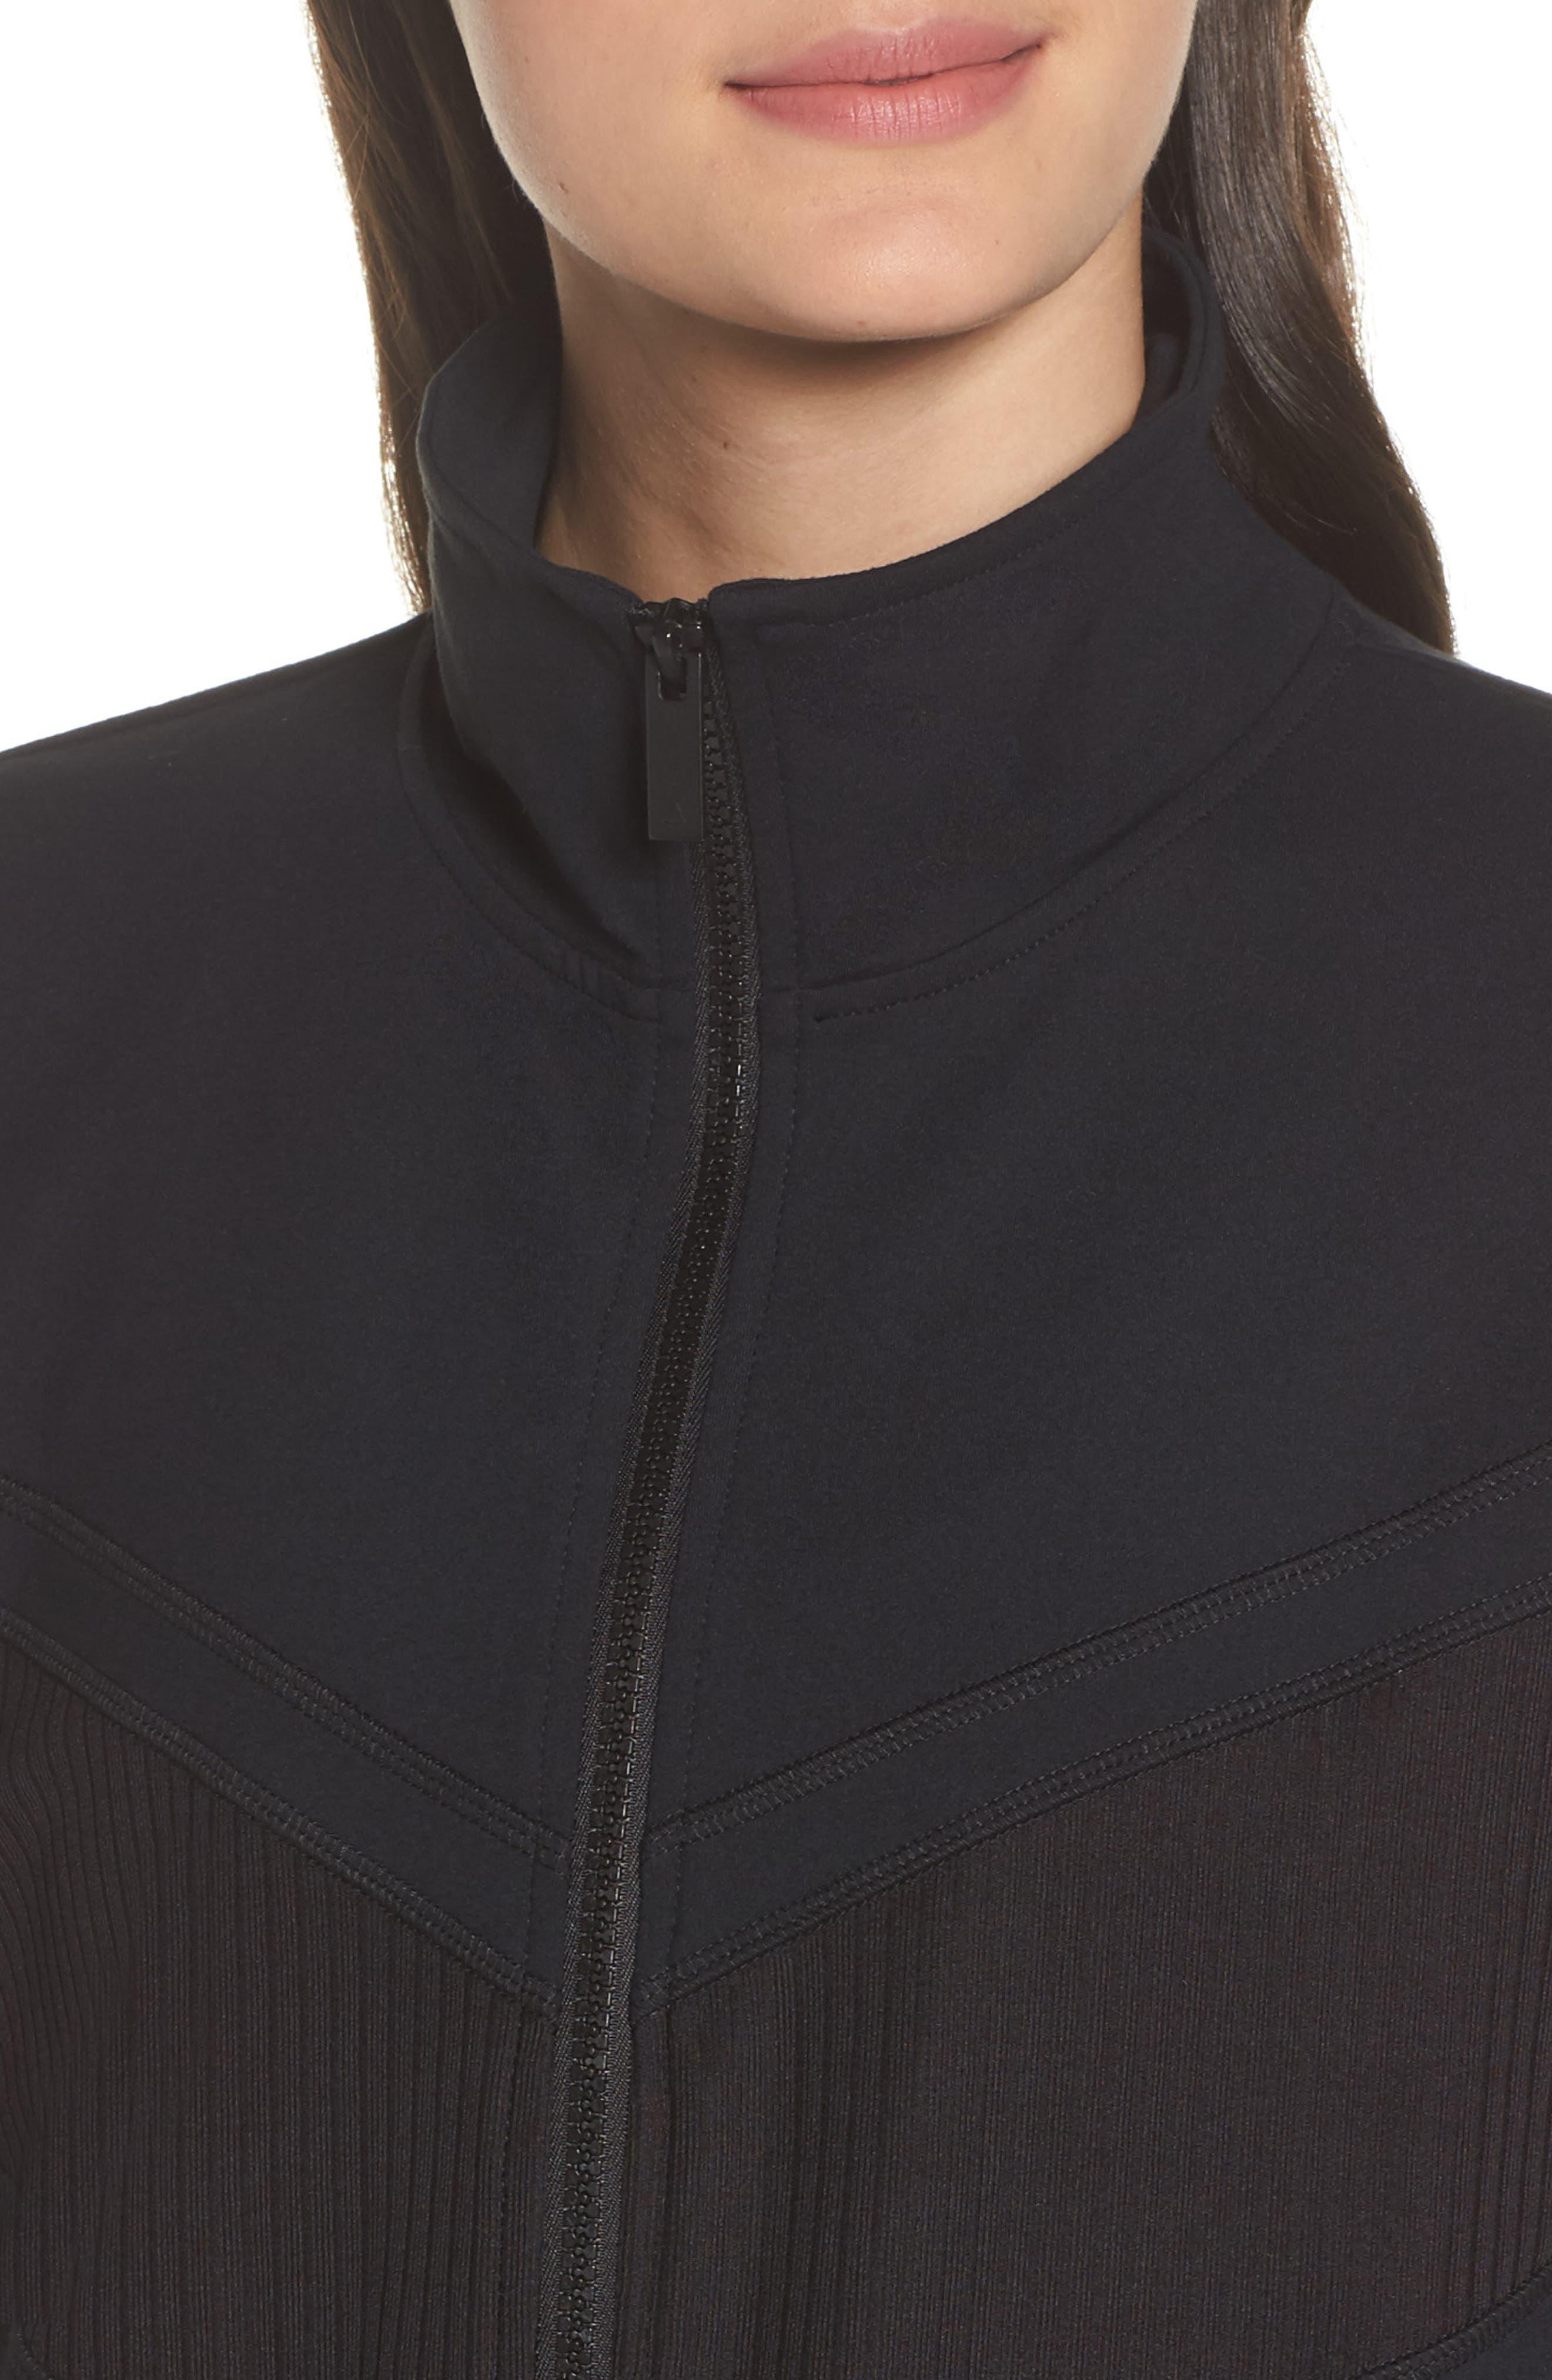 Cato Quarter Zip Pullover,                             Alternate thumbnail 4, color,                             Black